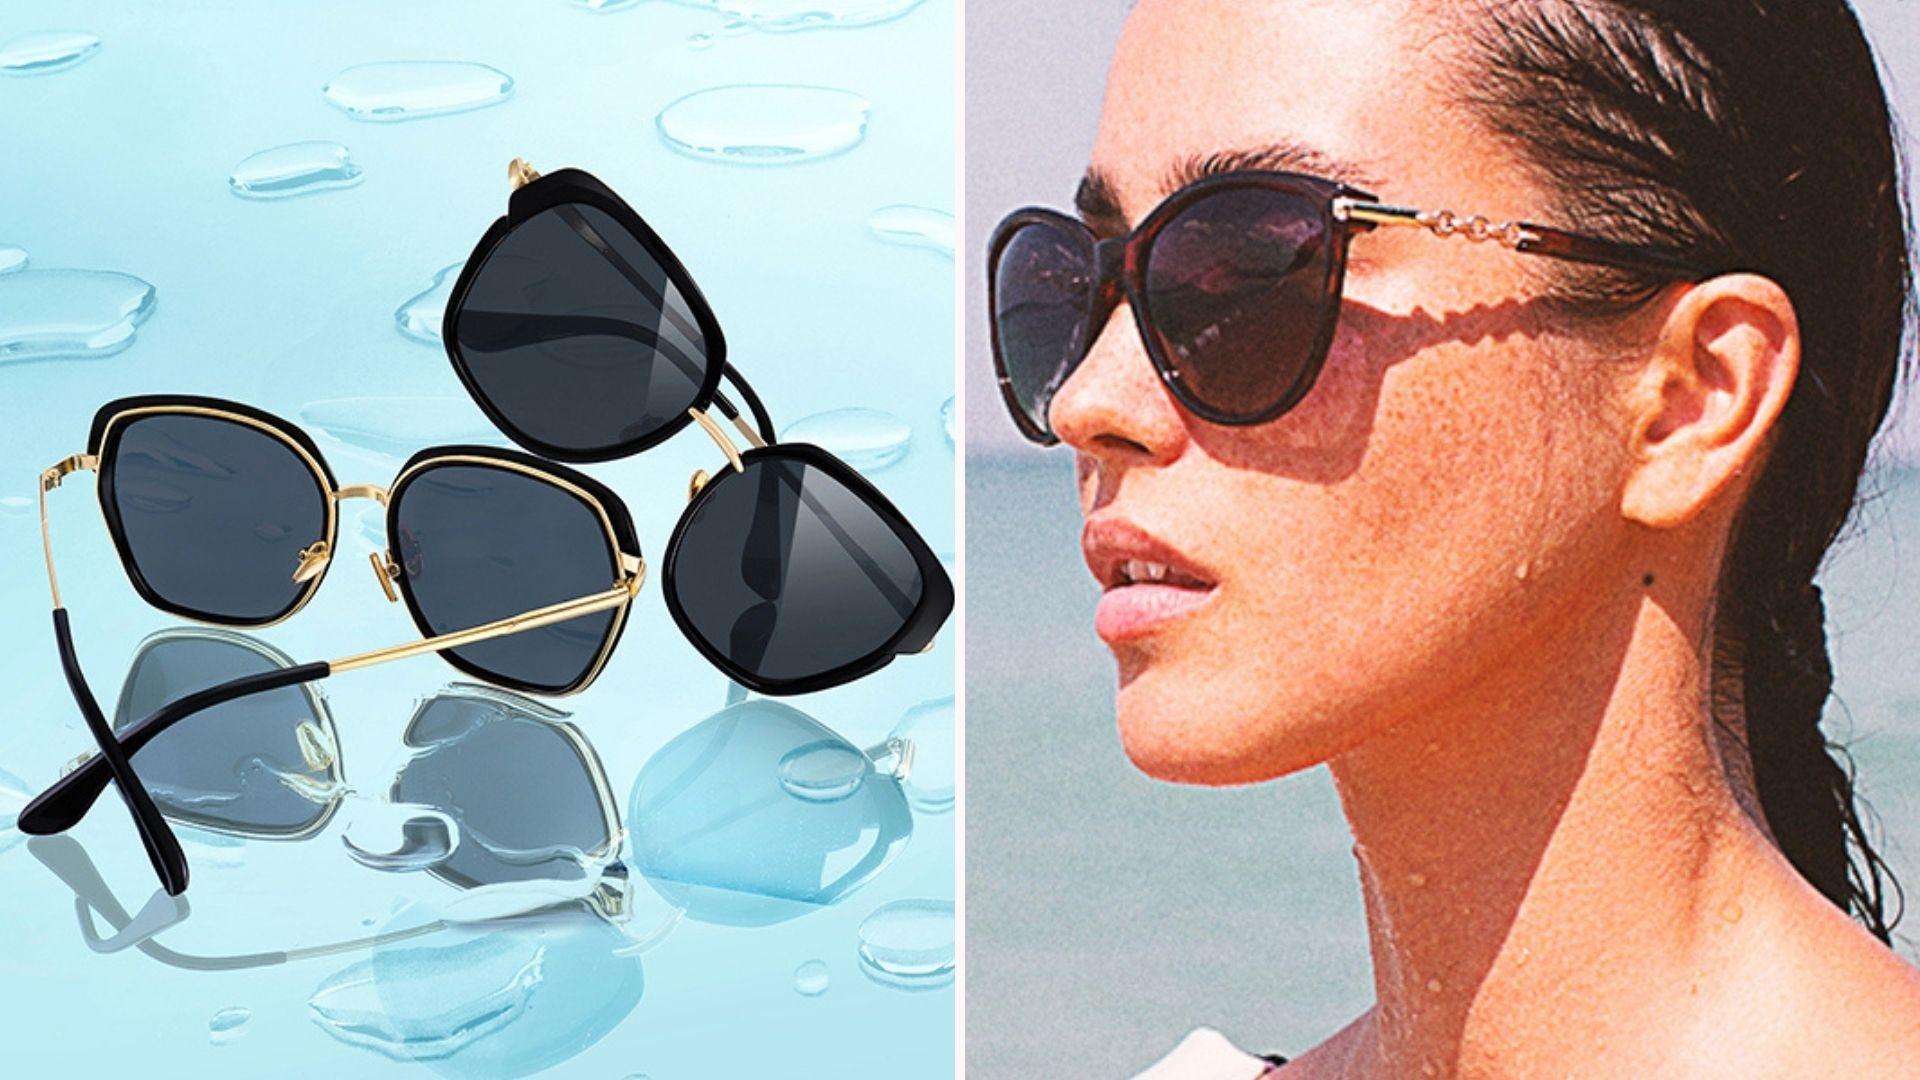 Shield-shaped sunglasses on a blue surface; a woman wearing sunglasses